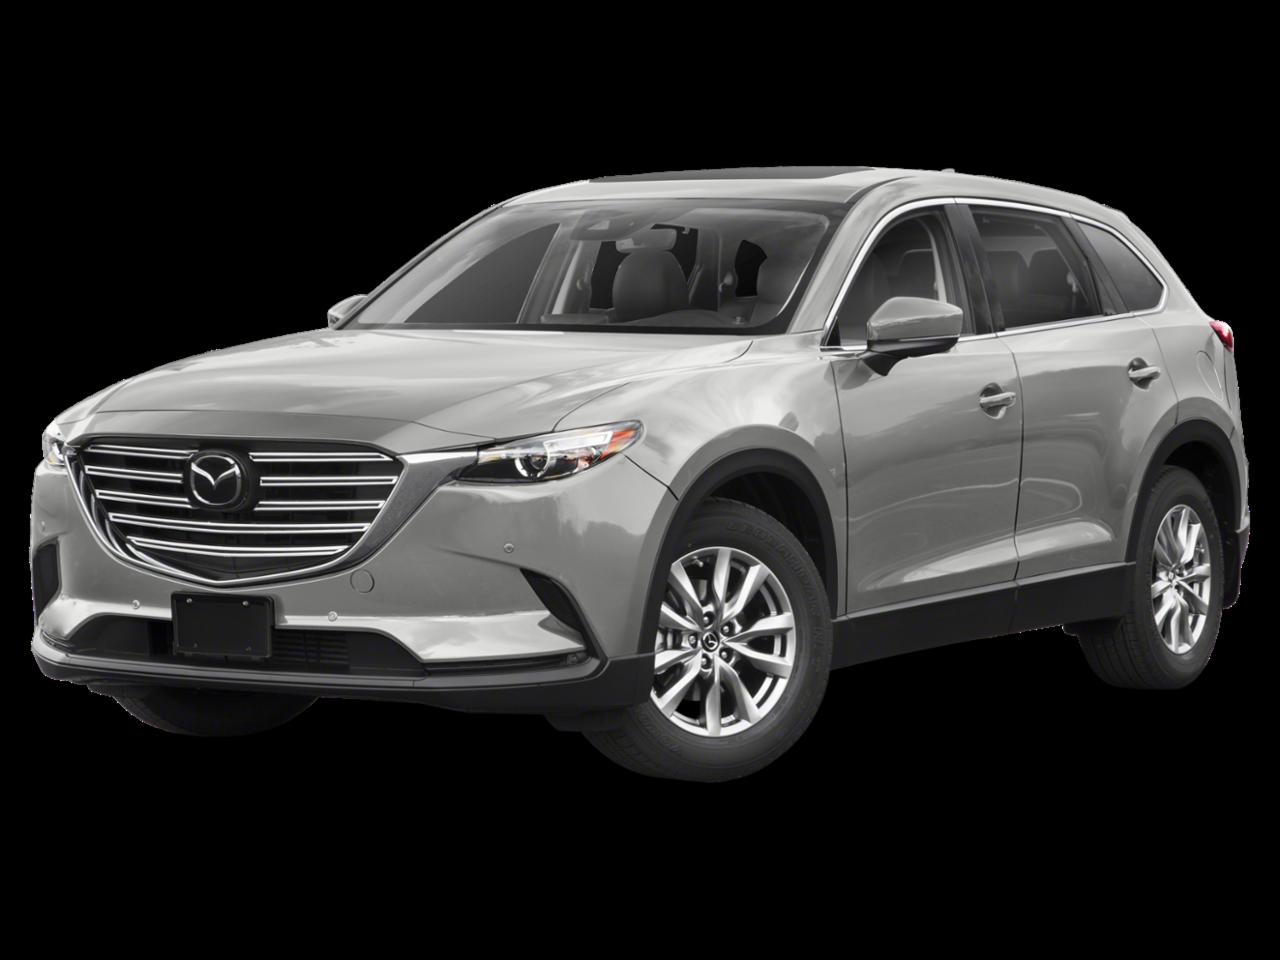 2020 Mazda CX-9 Touring FWD Sport Utility